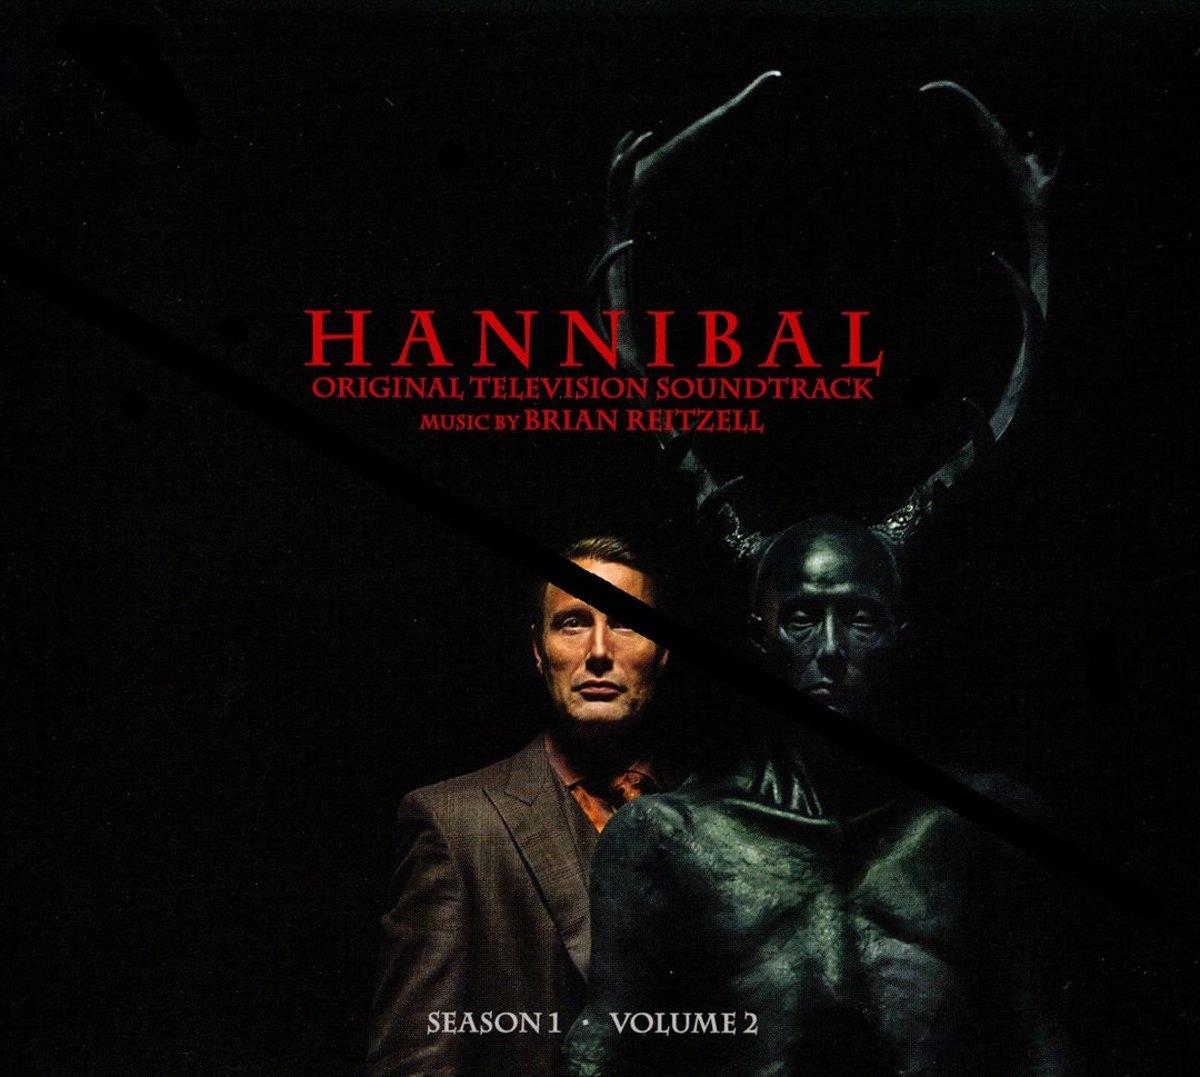 Hannibal Season 1 Volume 2 (Origina kopen